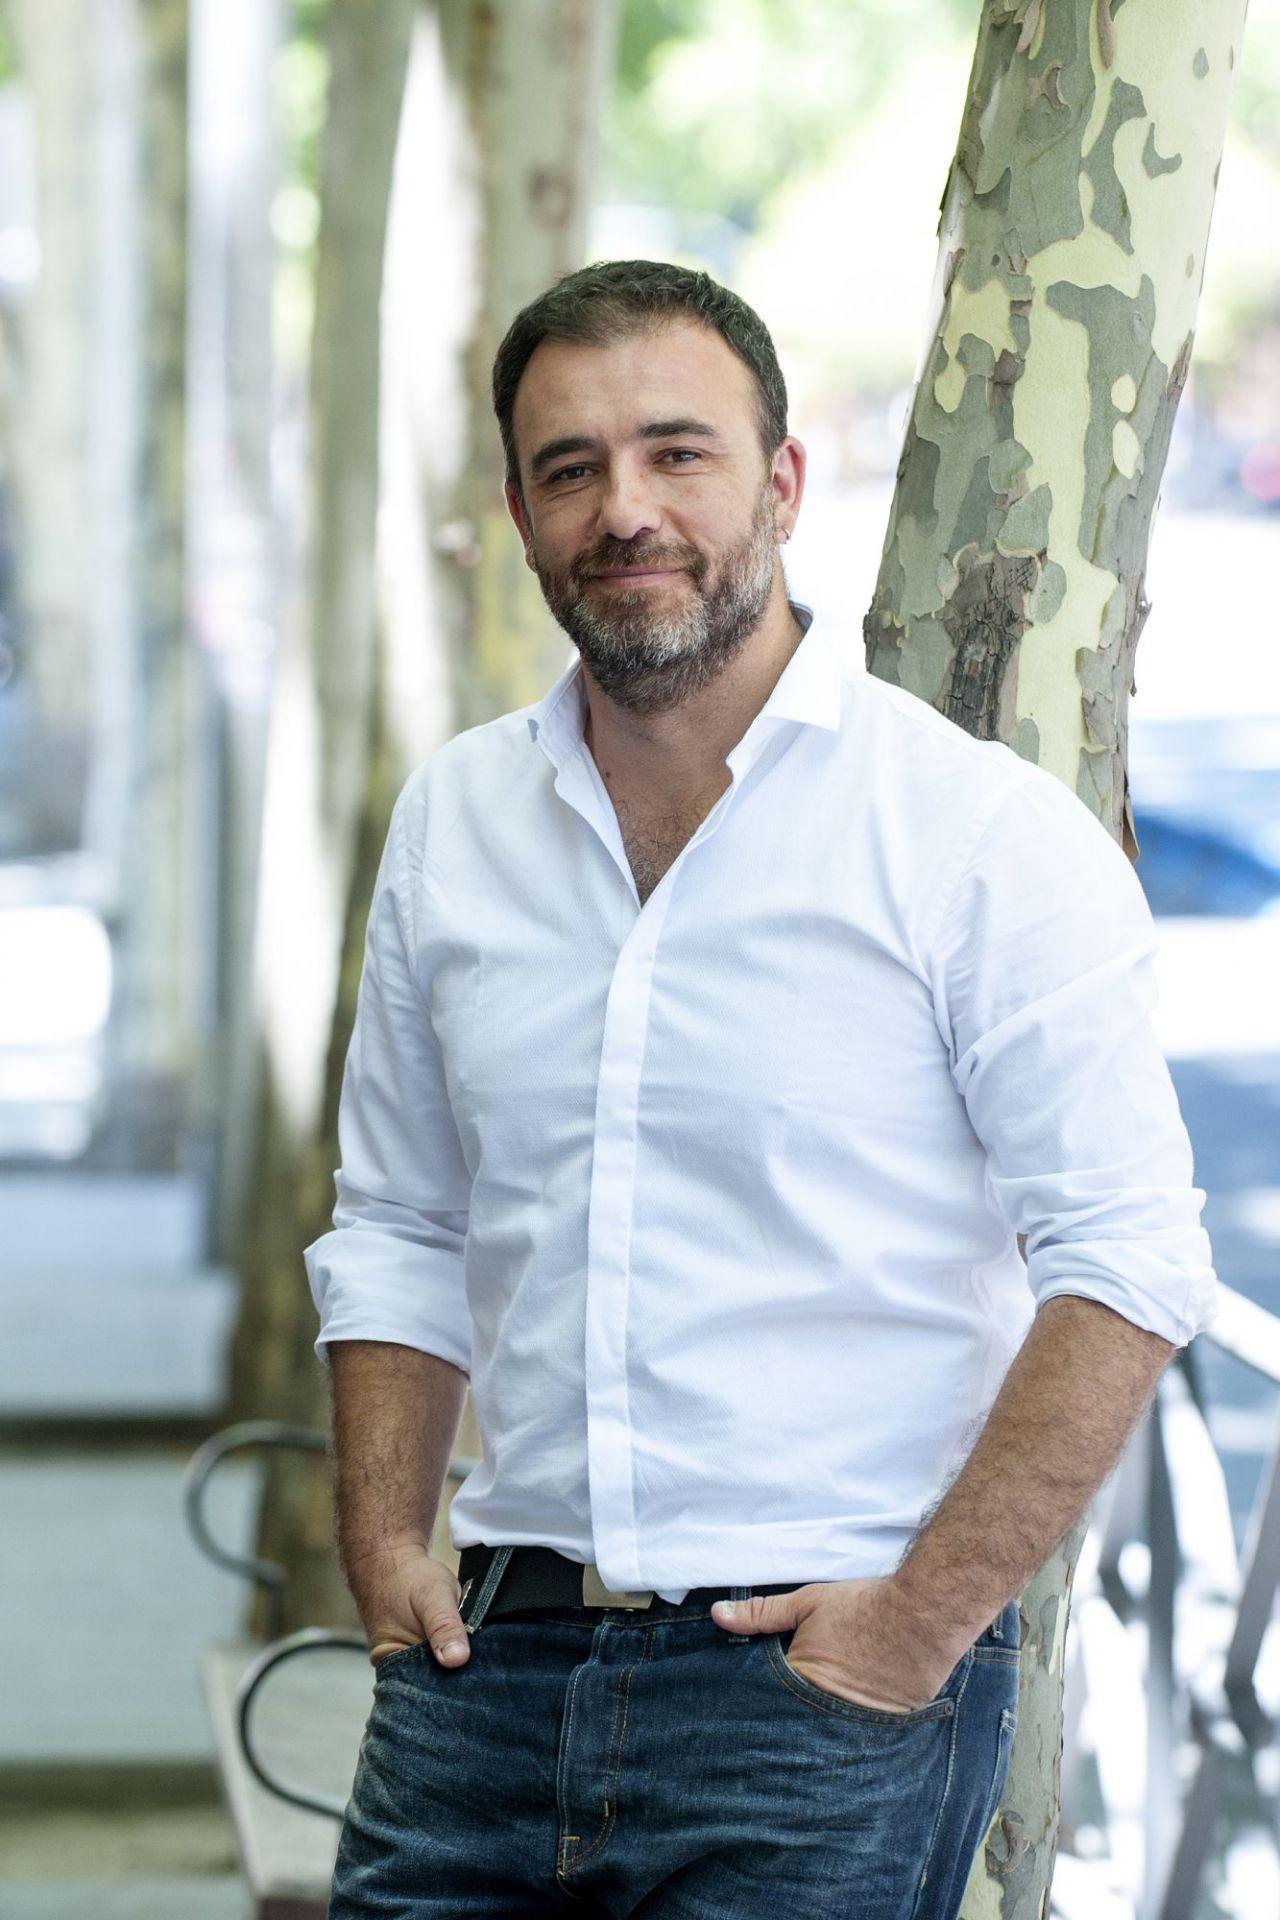 Nacho Murgui Parra